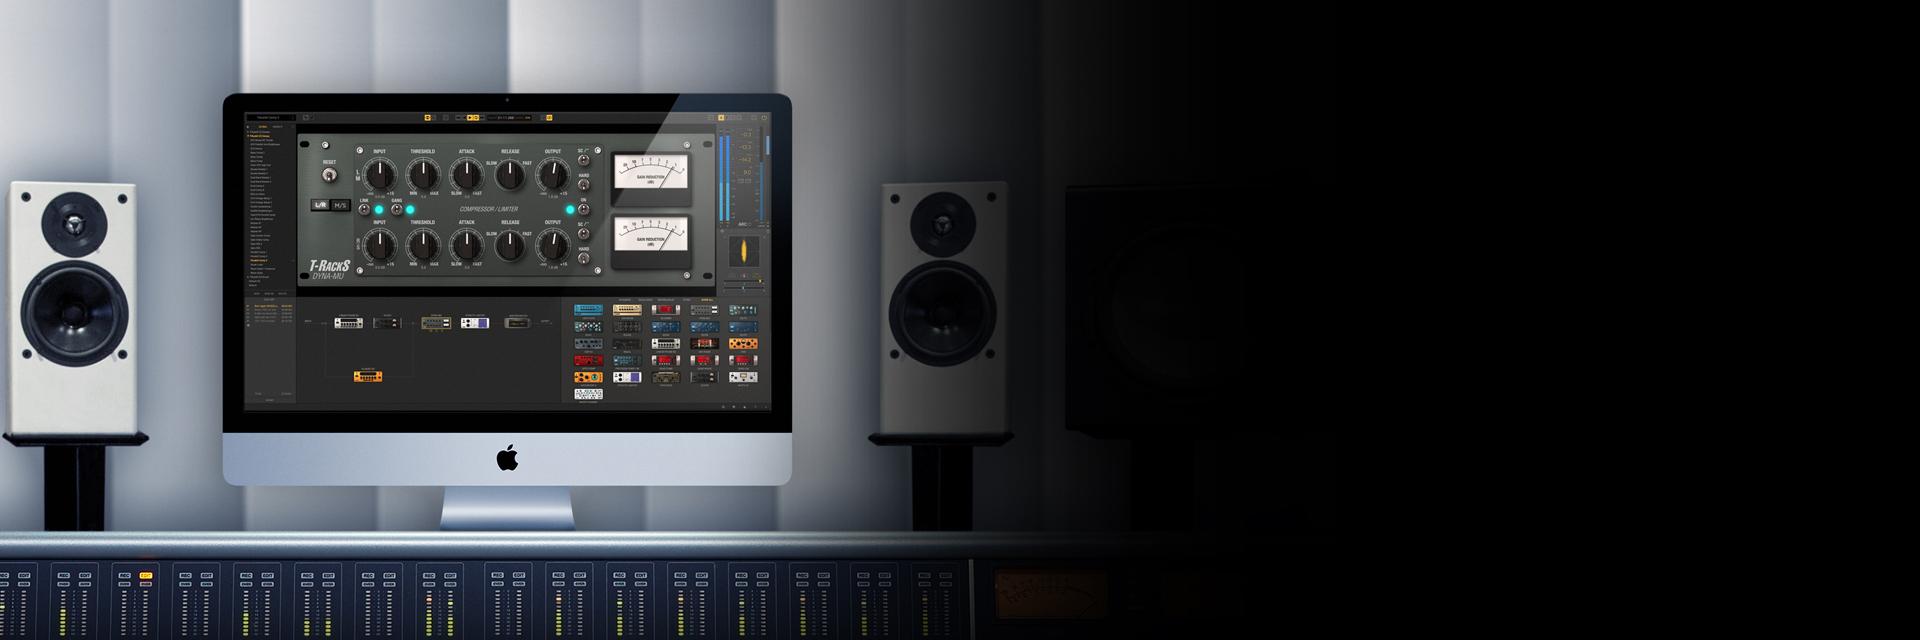 Ik Multimedia Irig Pro Duo Studio Suite Bundle Audio Interface Mic Headphones To Adopt Advanced Technology Pro Audio Equipment Musical Instruments & Gear